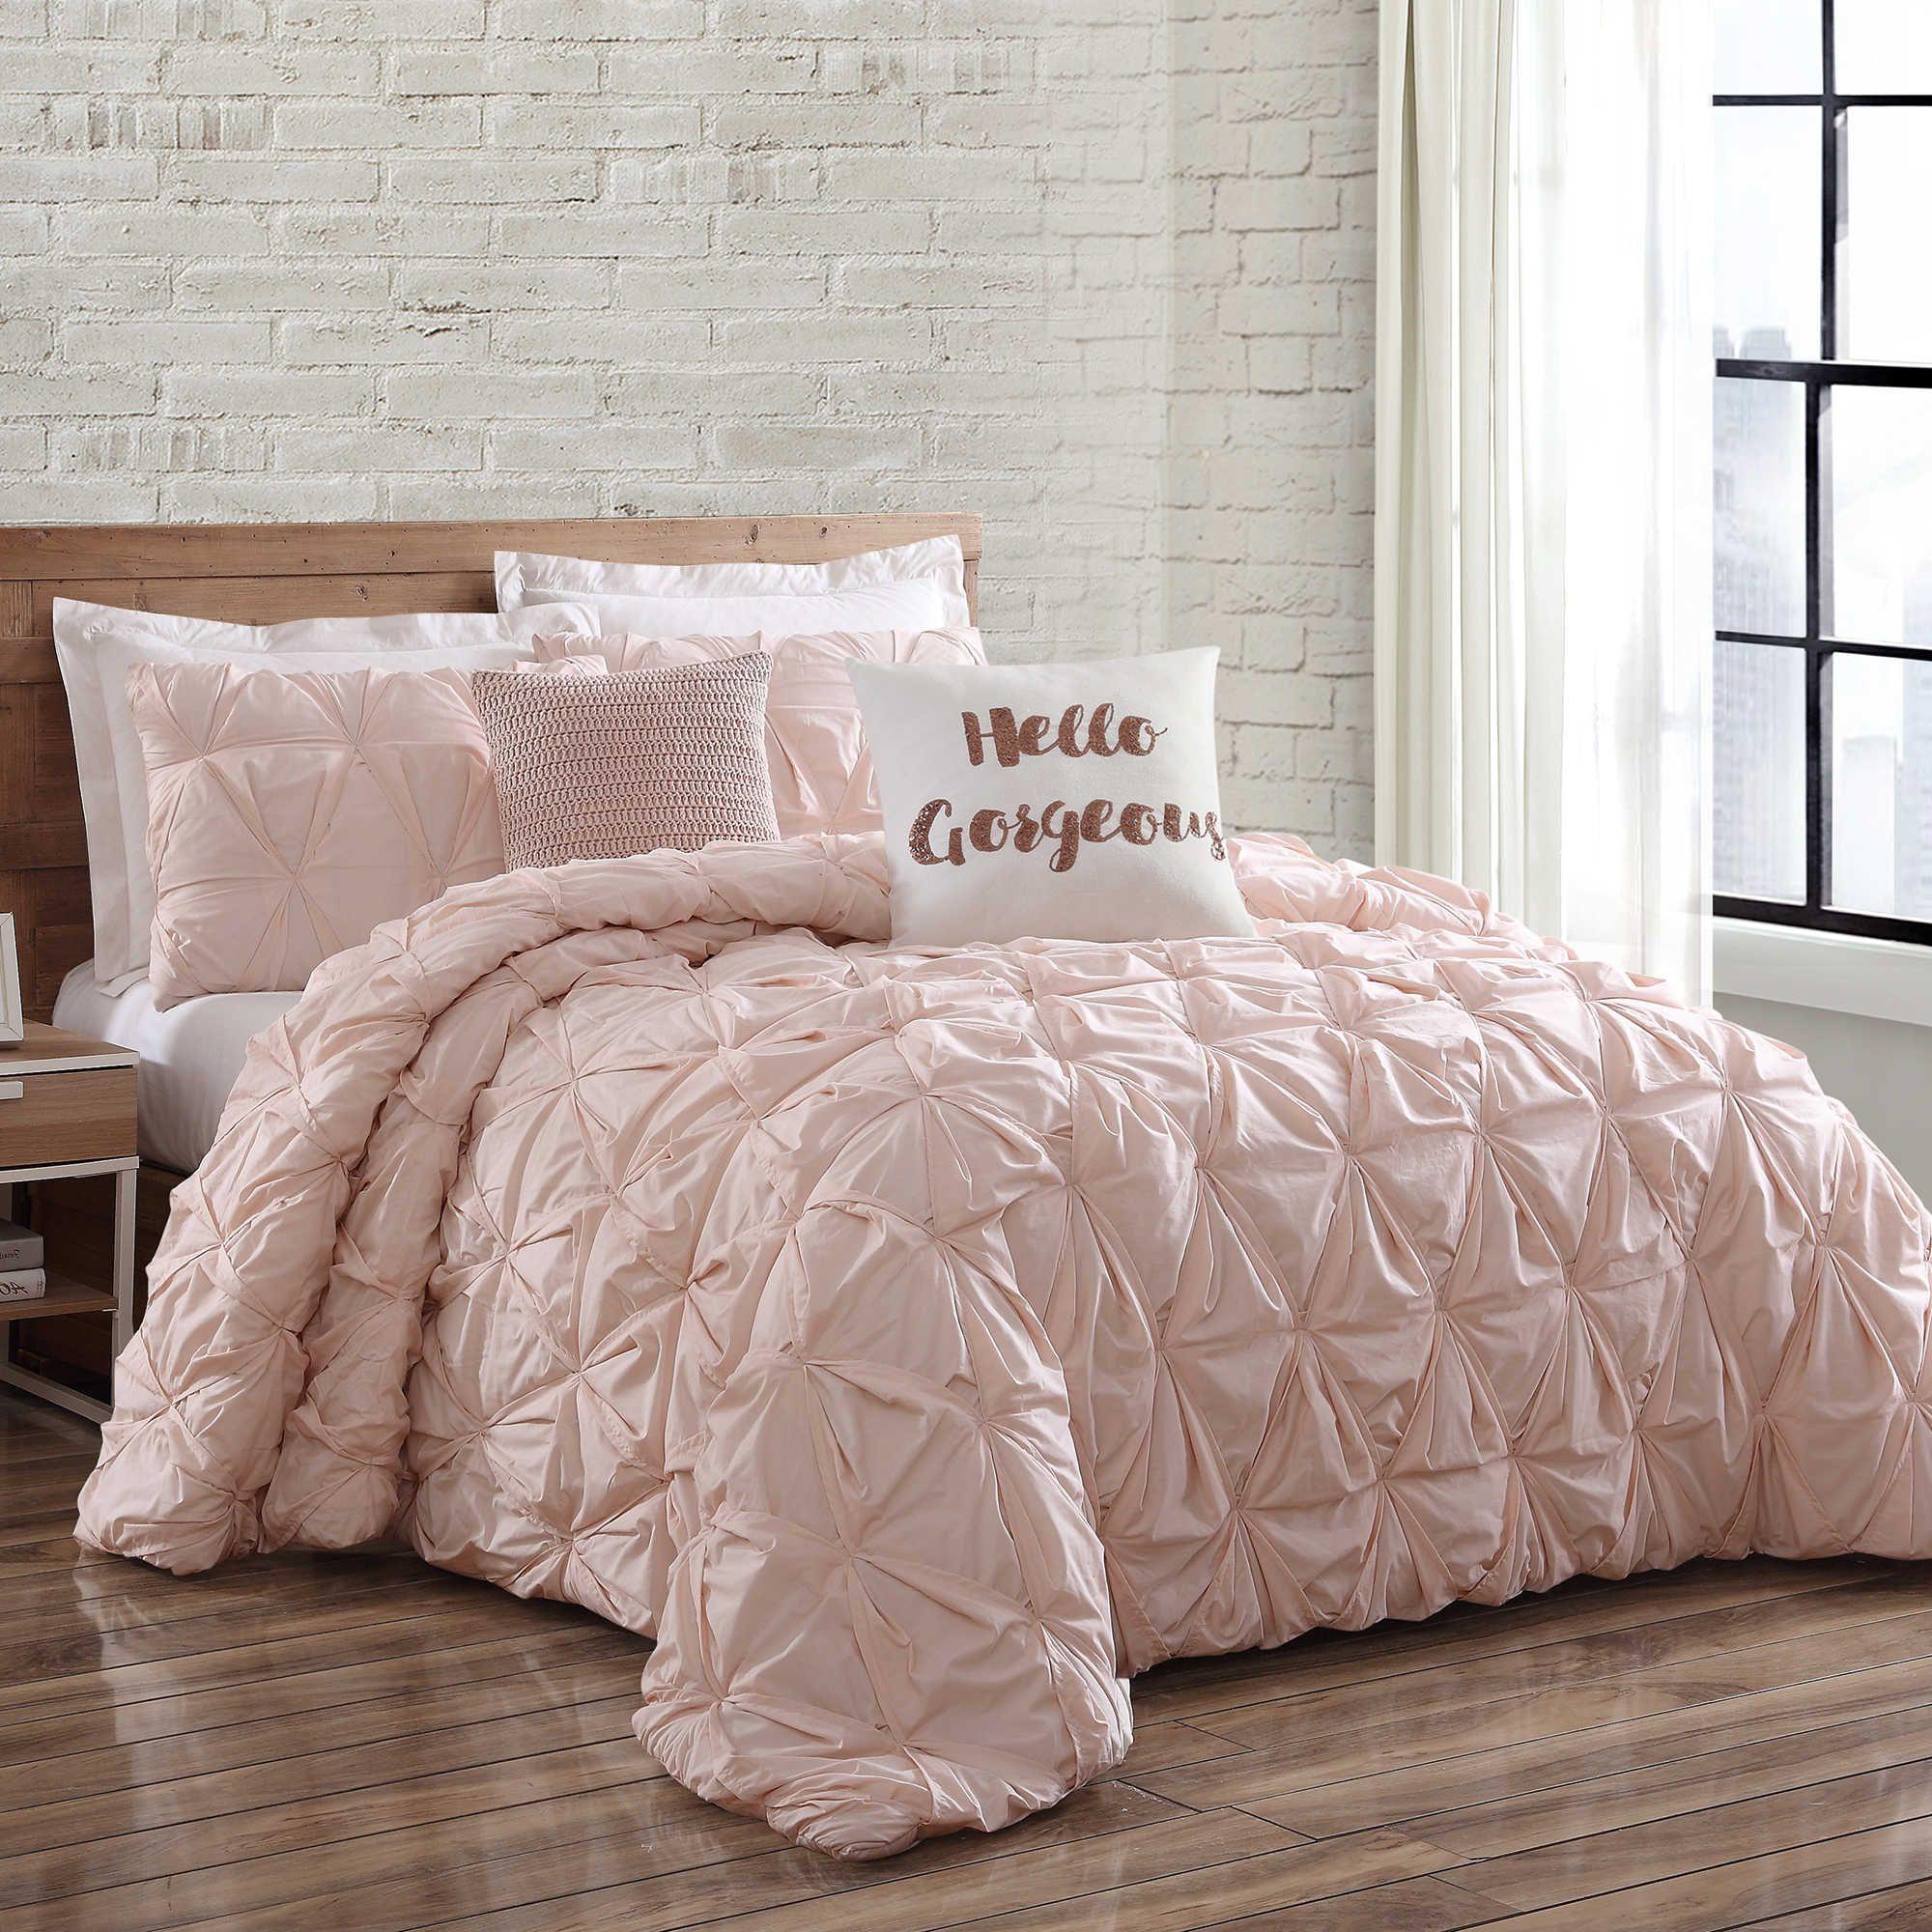 Brooklyn Loom Jackson Pleat Full Queen Comforter Set In Blush